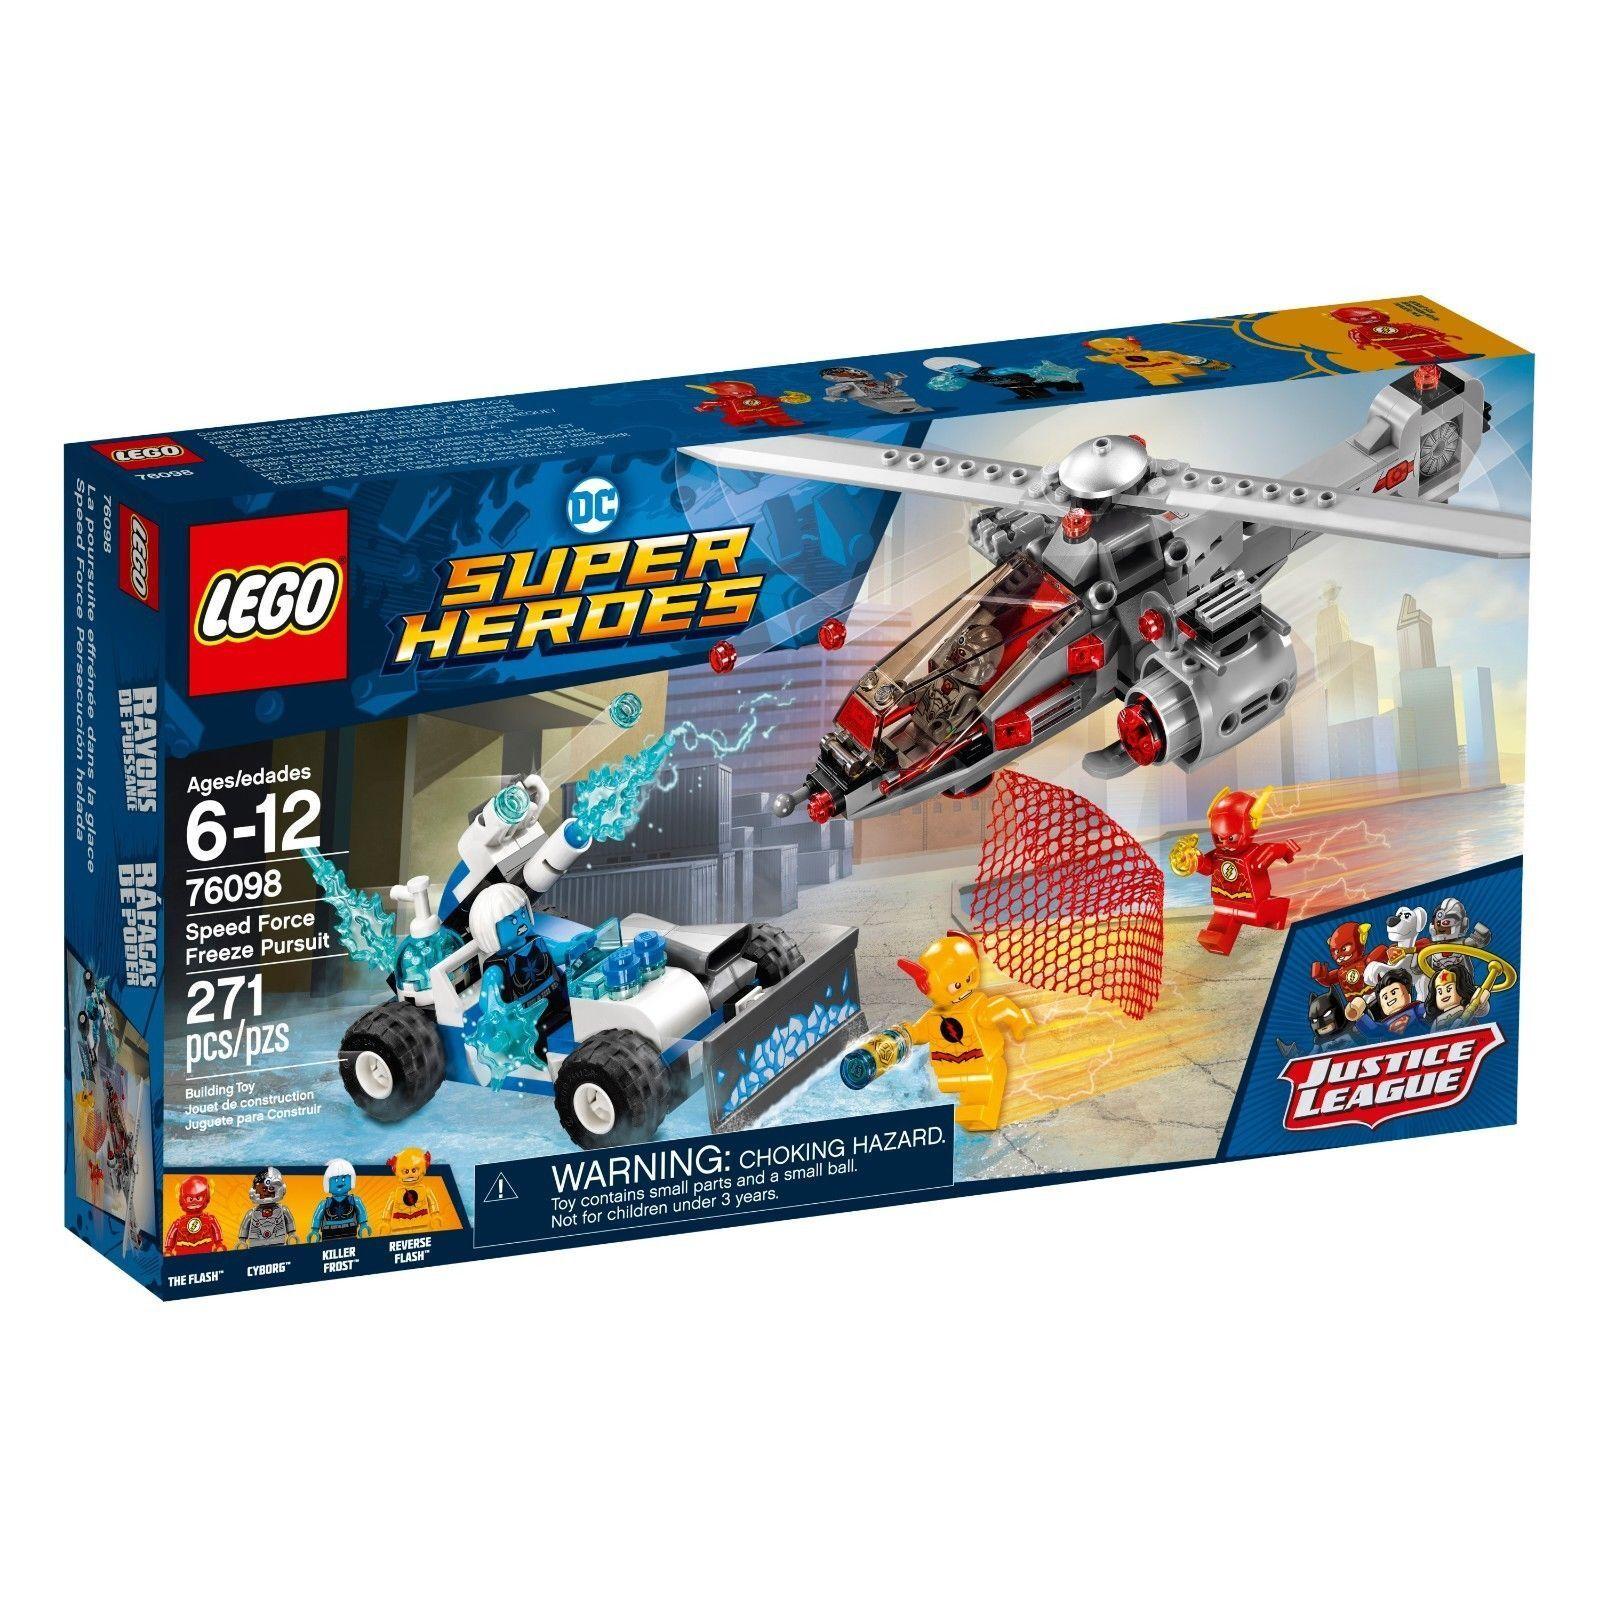 76098 SPEED FORCE FREEZE PURSUIT reverse flash lego legos set NEW cyborg FROST